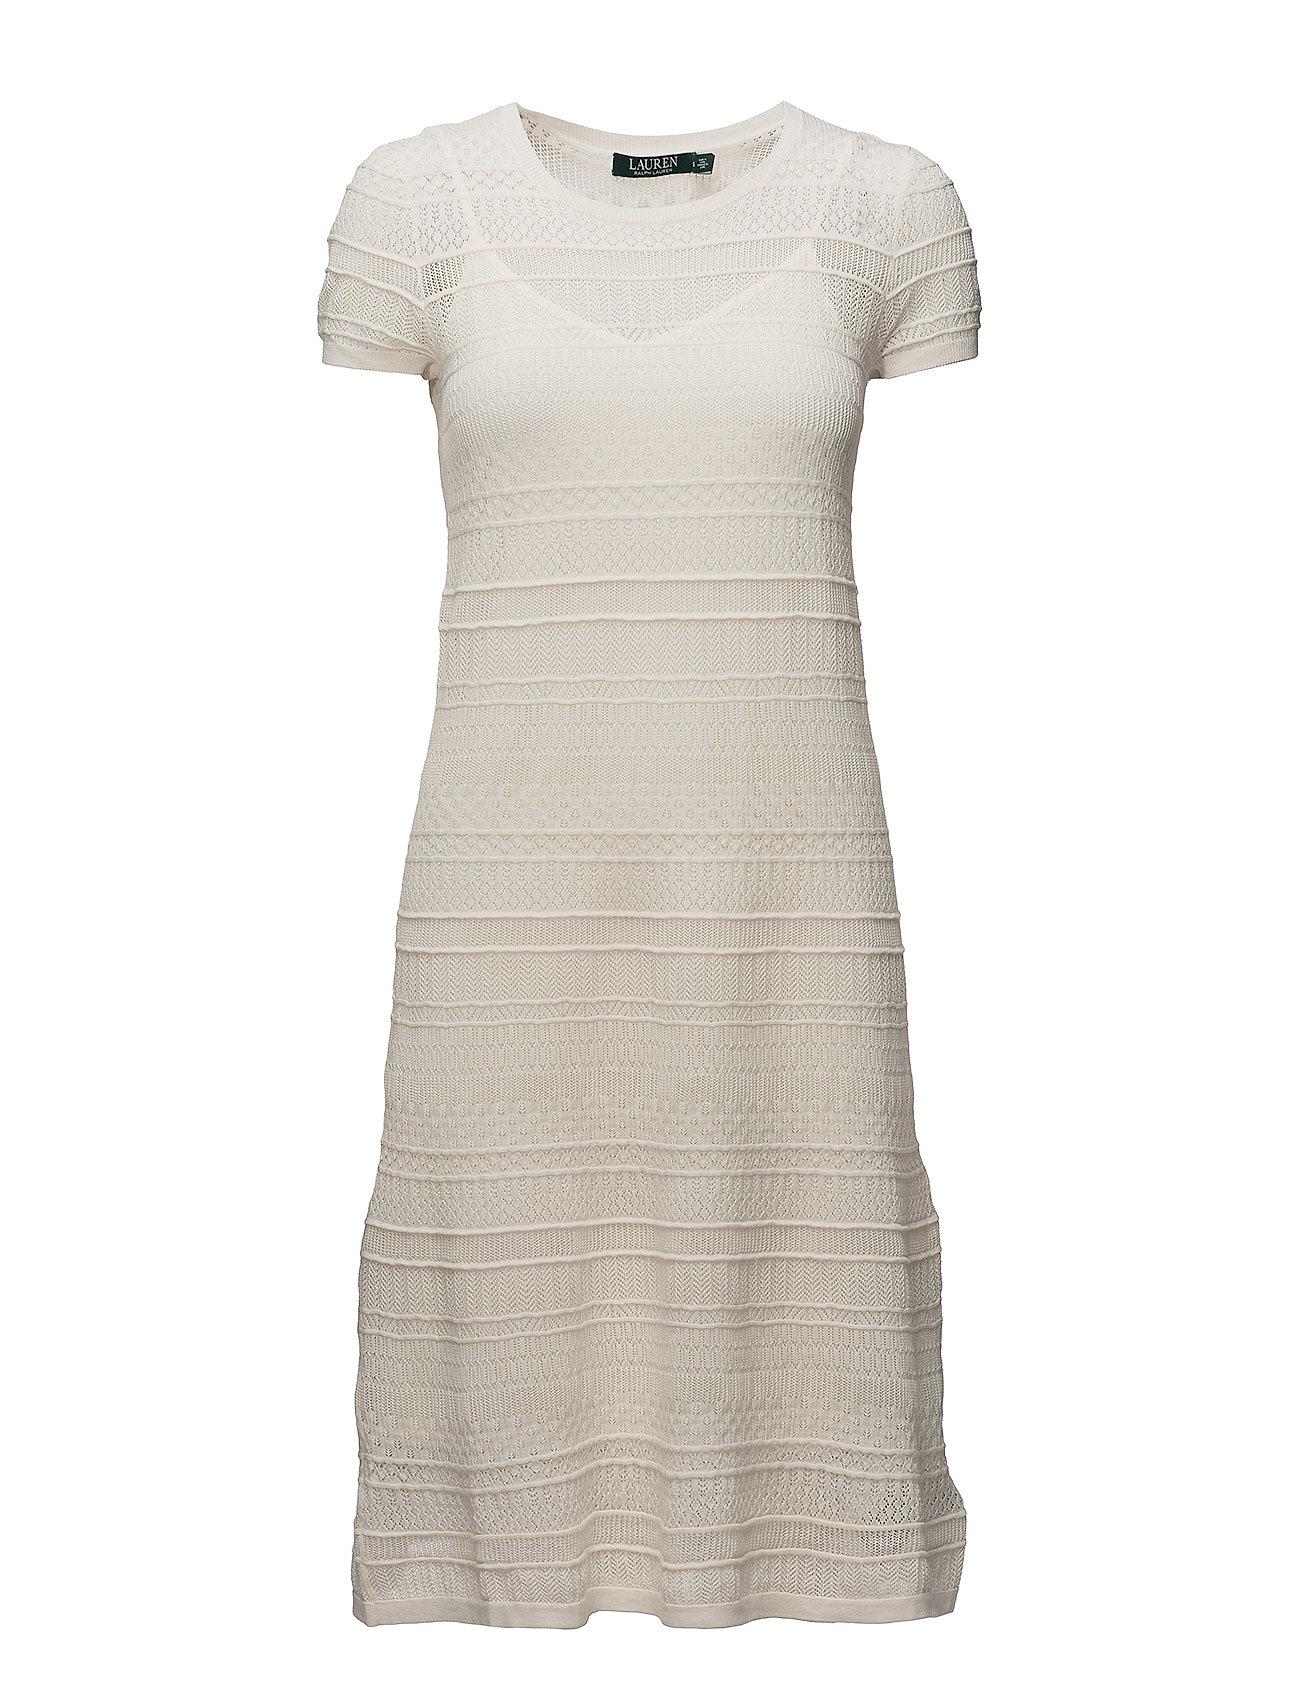 Lauren Ralph Lauren COTTON NYLON-S/S CN DRESS - MASCARPONE CREAM